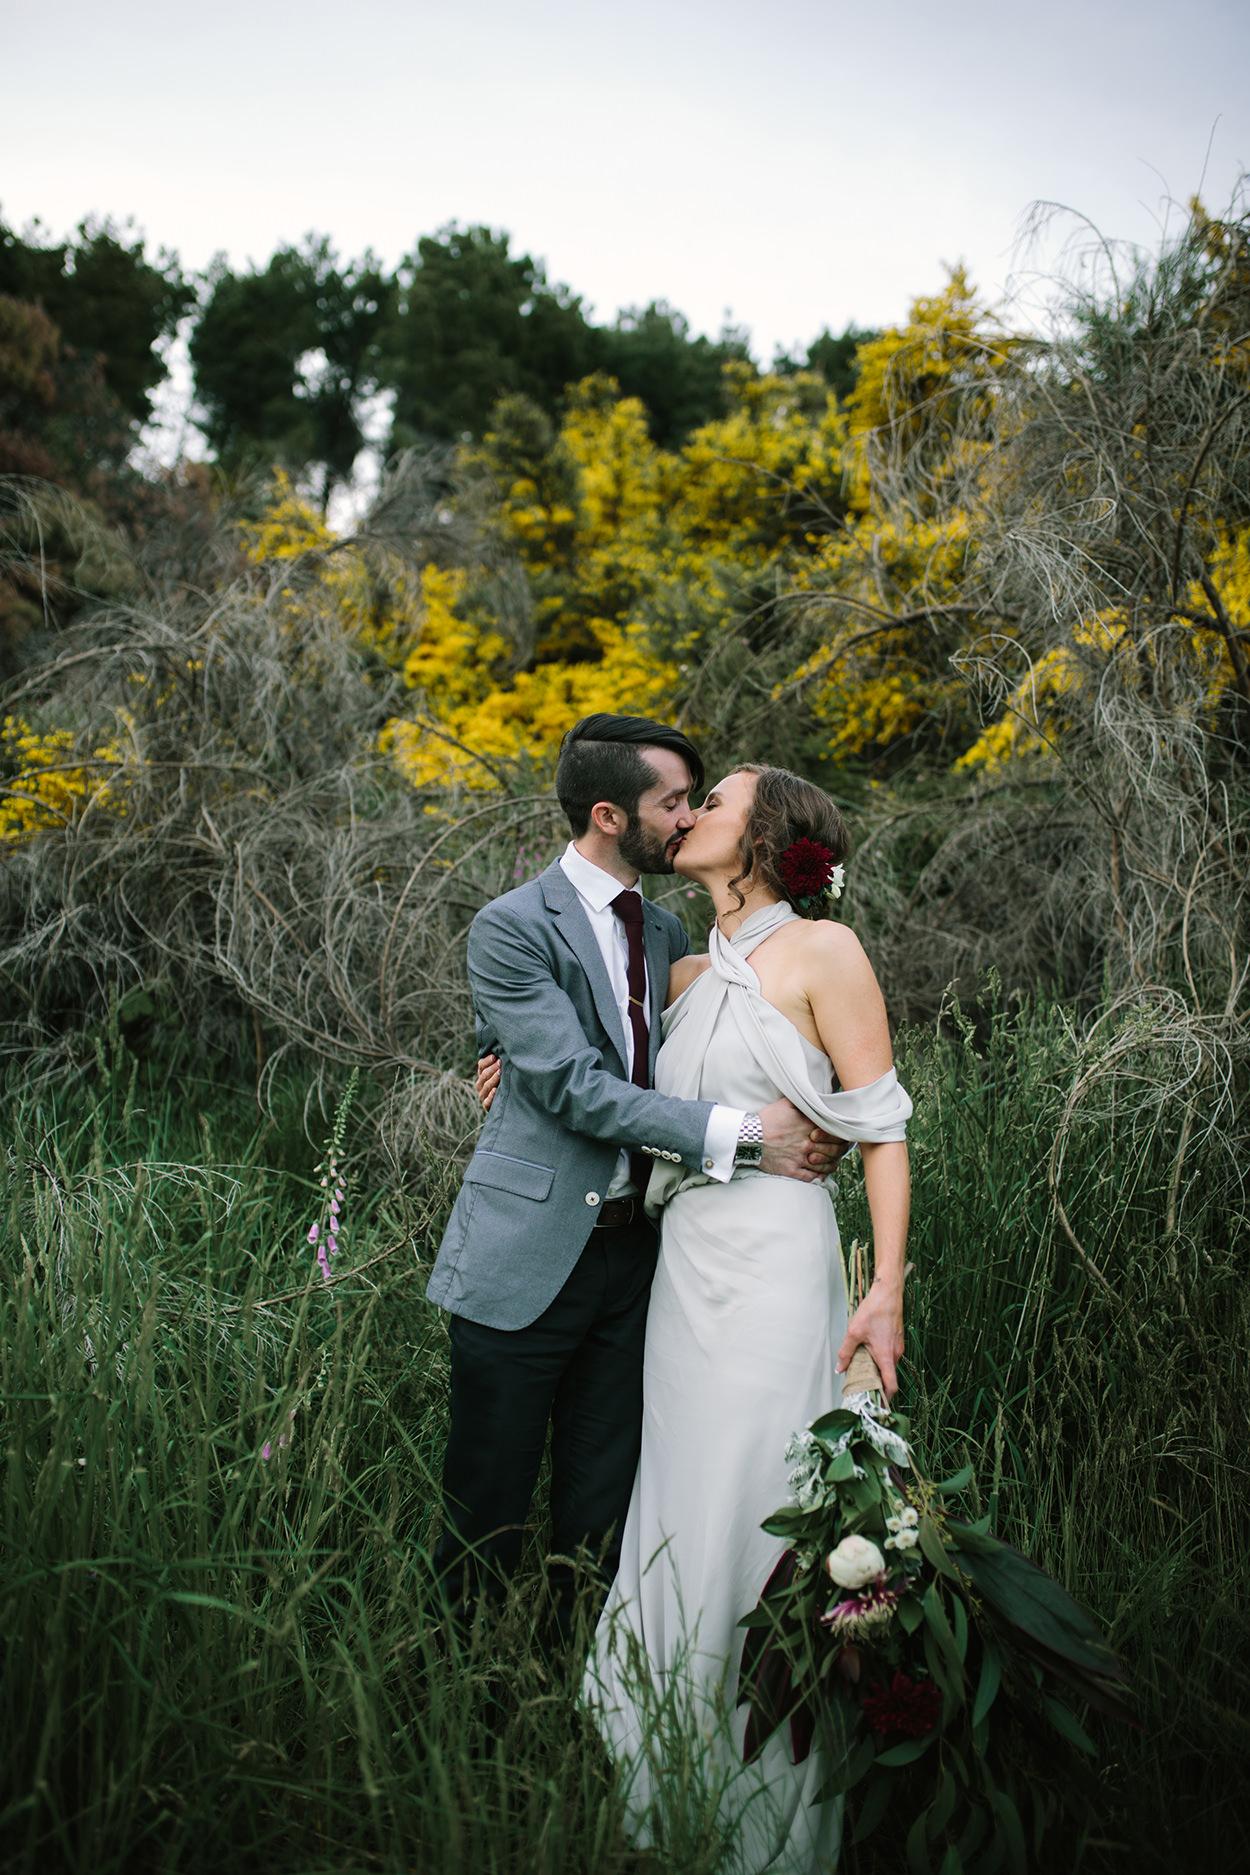 I-Got-You-Babe-Weddings-Cara-Joel-Elopement-New-Zealand0113.JPG